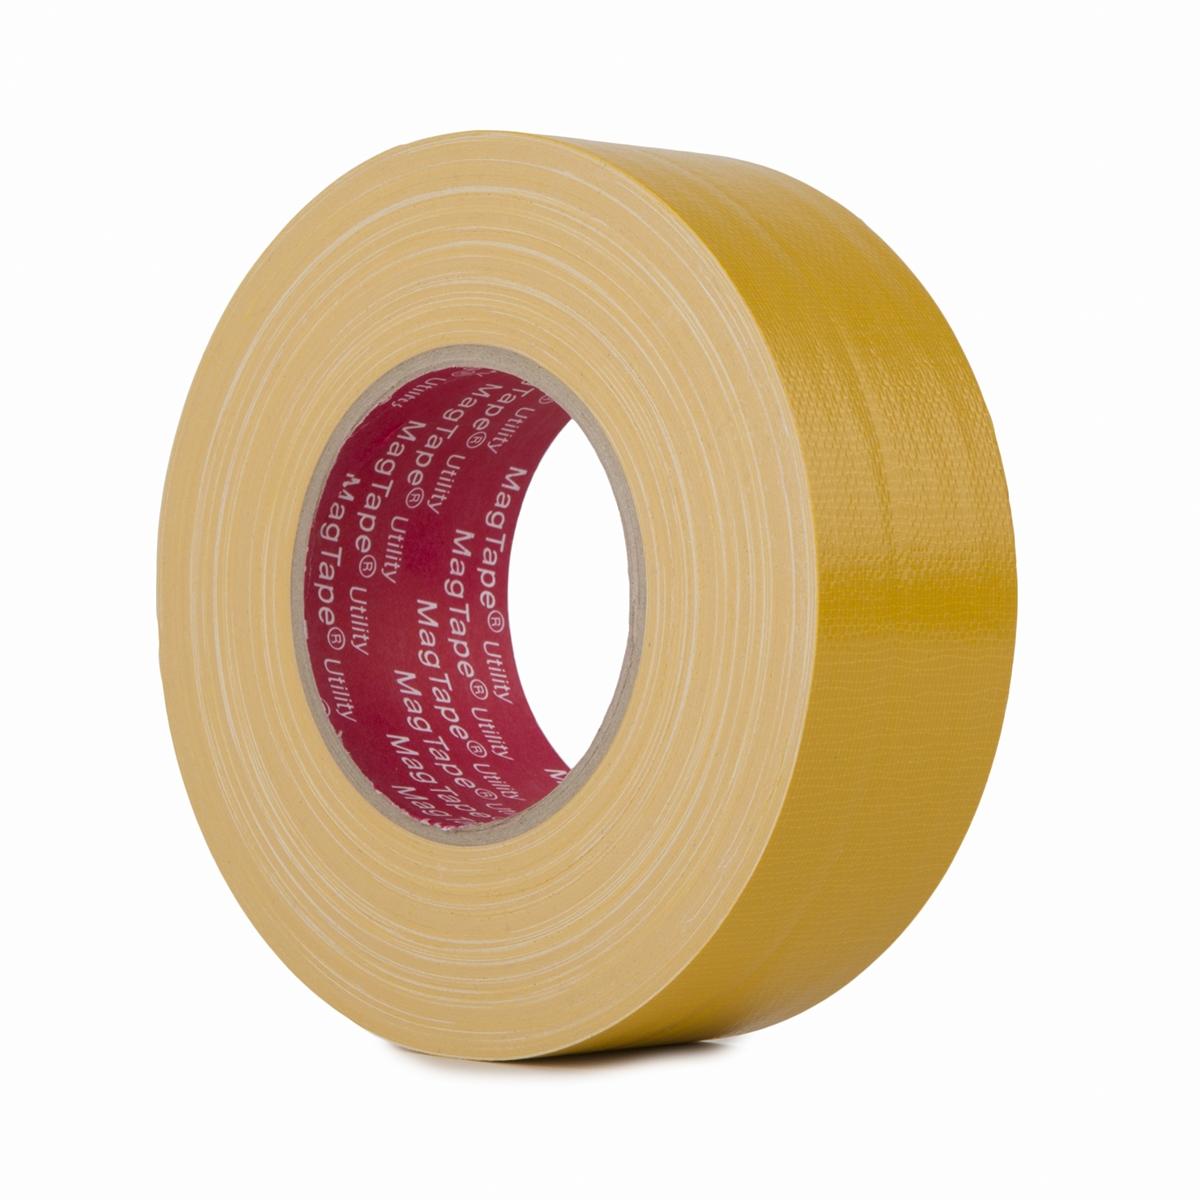 MagTape Utility gaffa tape 50mm x 50m geel